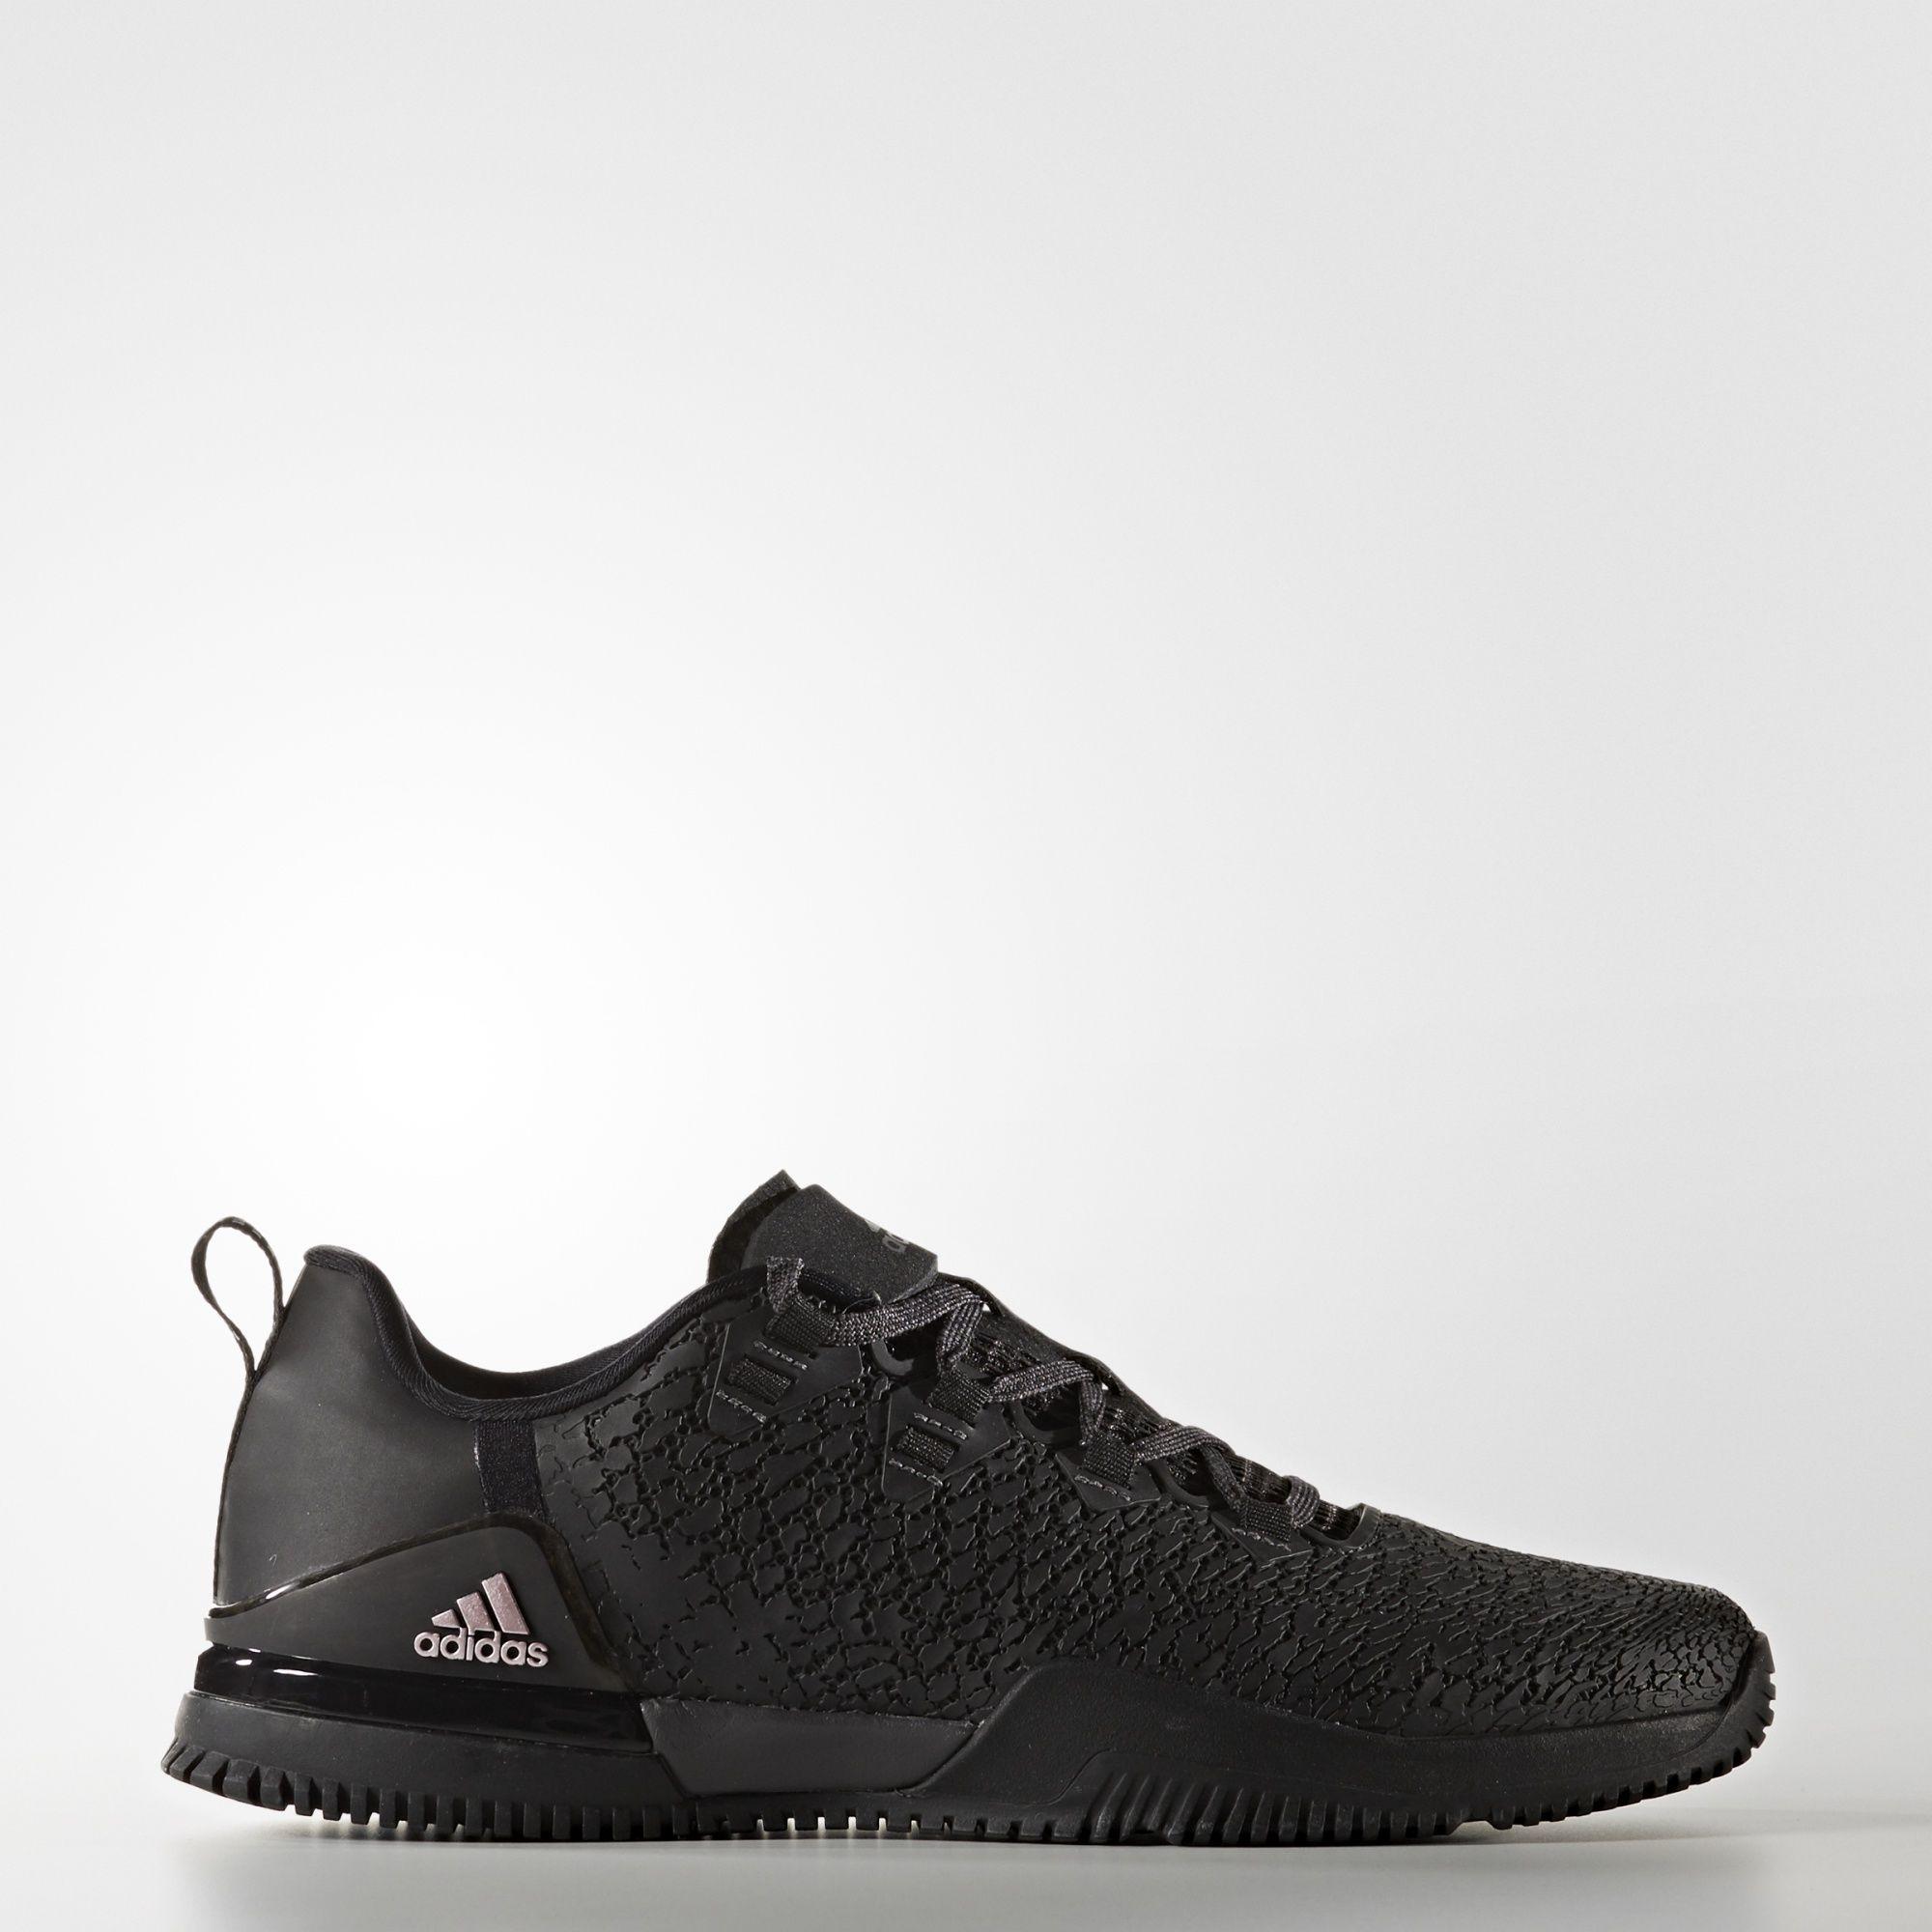 Adidas Crazypower Trainer Shoes Adidas Shoes Women Mens Training Shoes Black Tennis Shoes